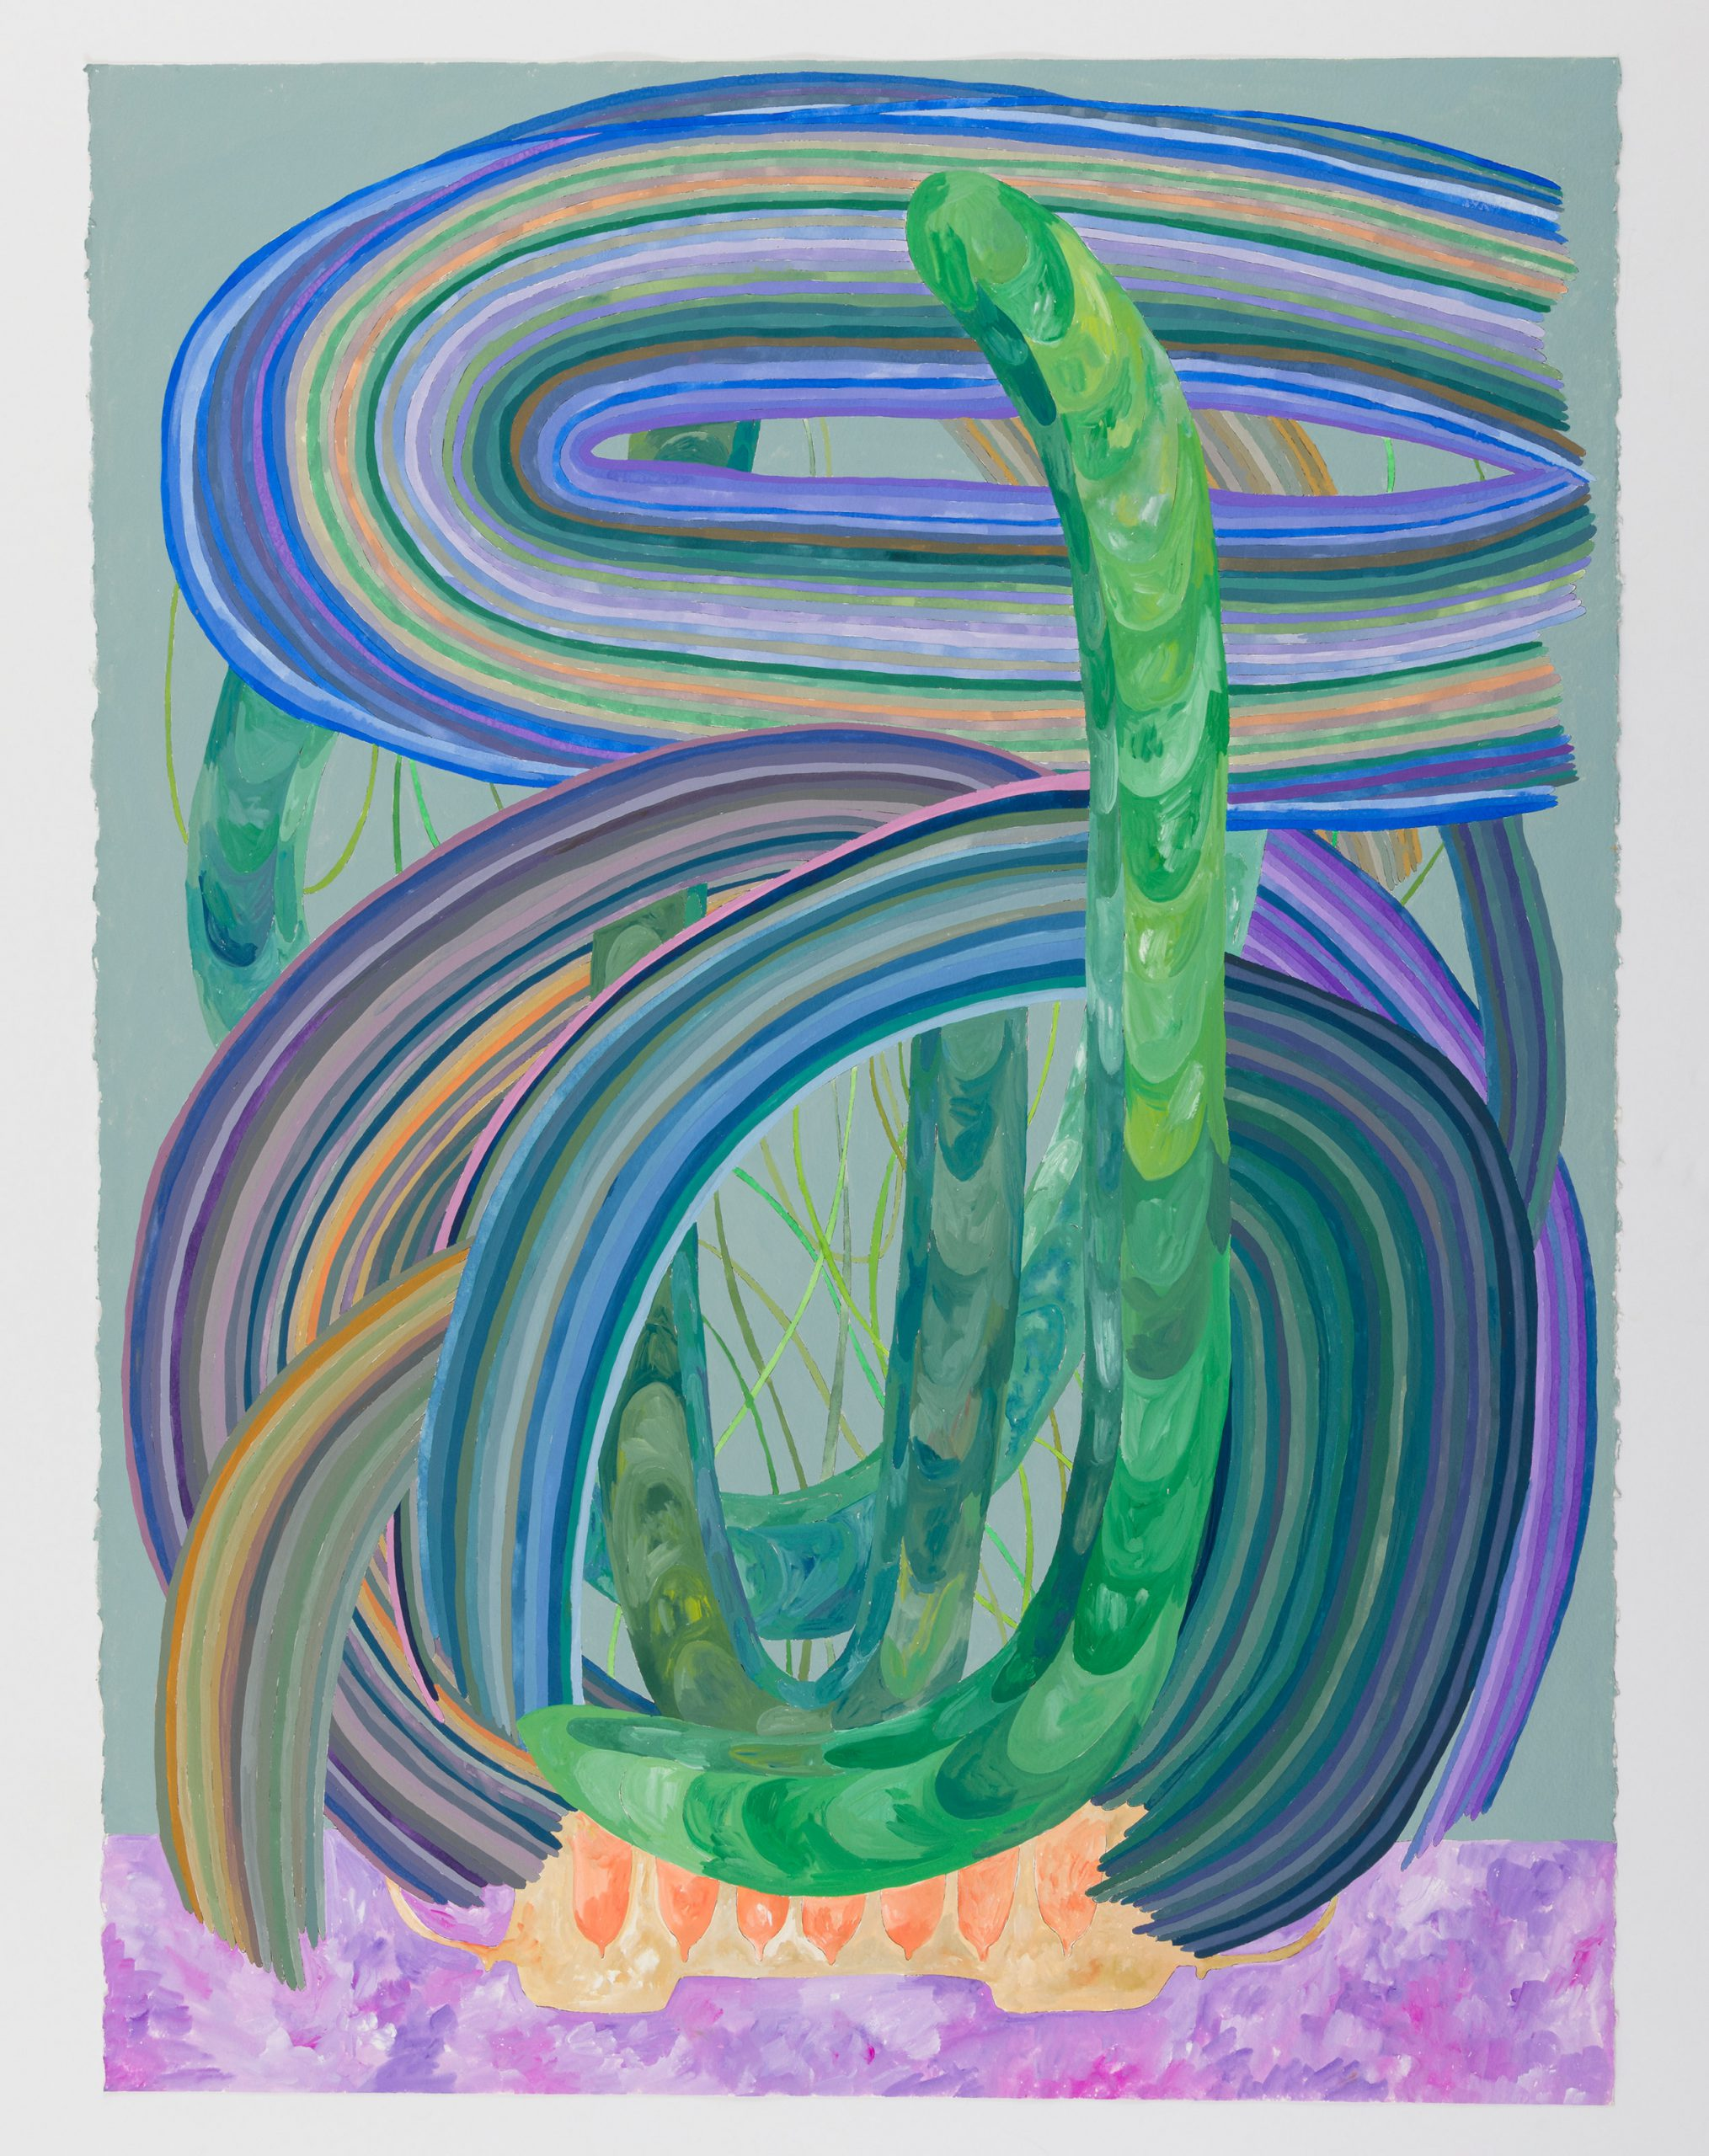 Matt Wedel Potted Plant, 2020